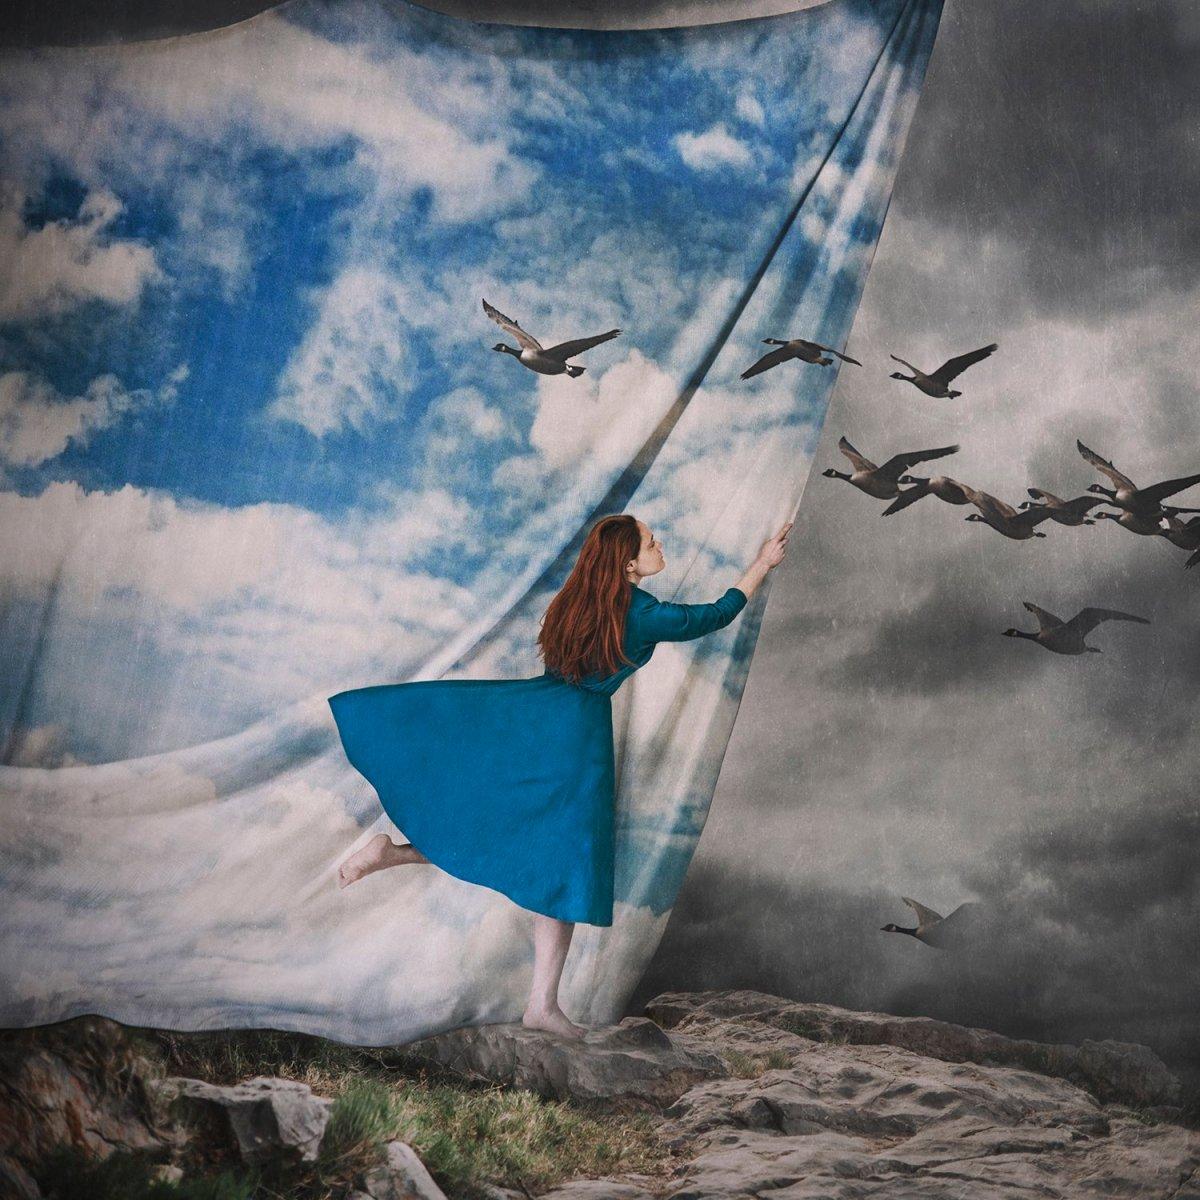 Otherworldly Imagery Of Frank Diamond surreal photography The false sky